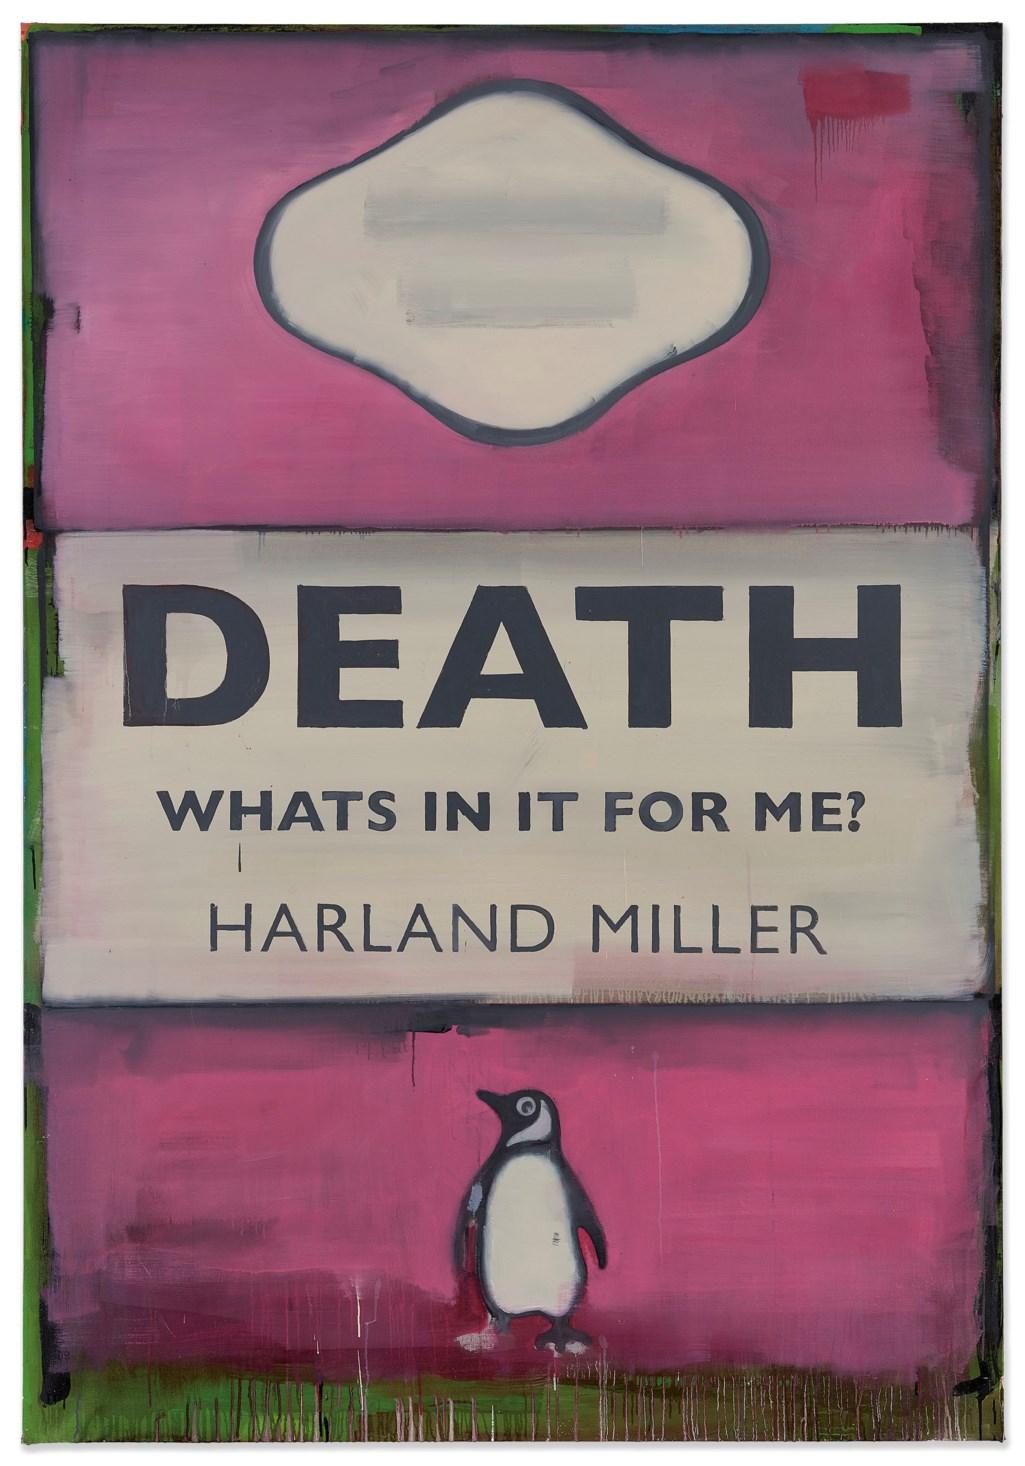 Harland Miller (b. 1964)